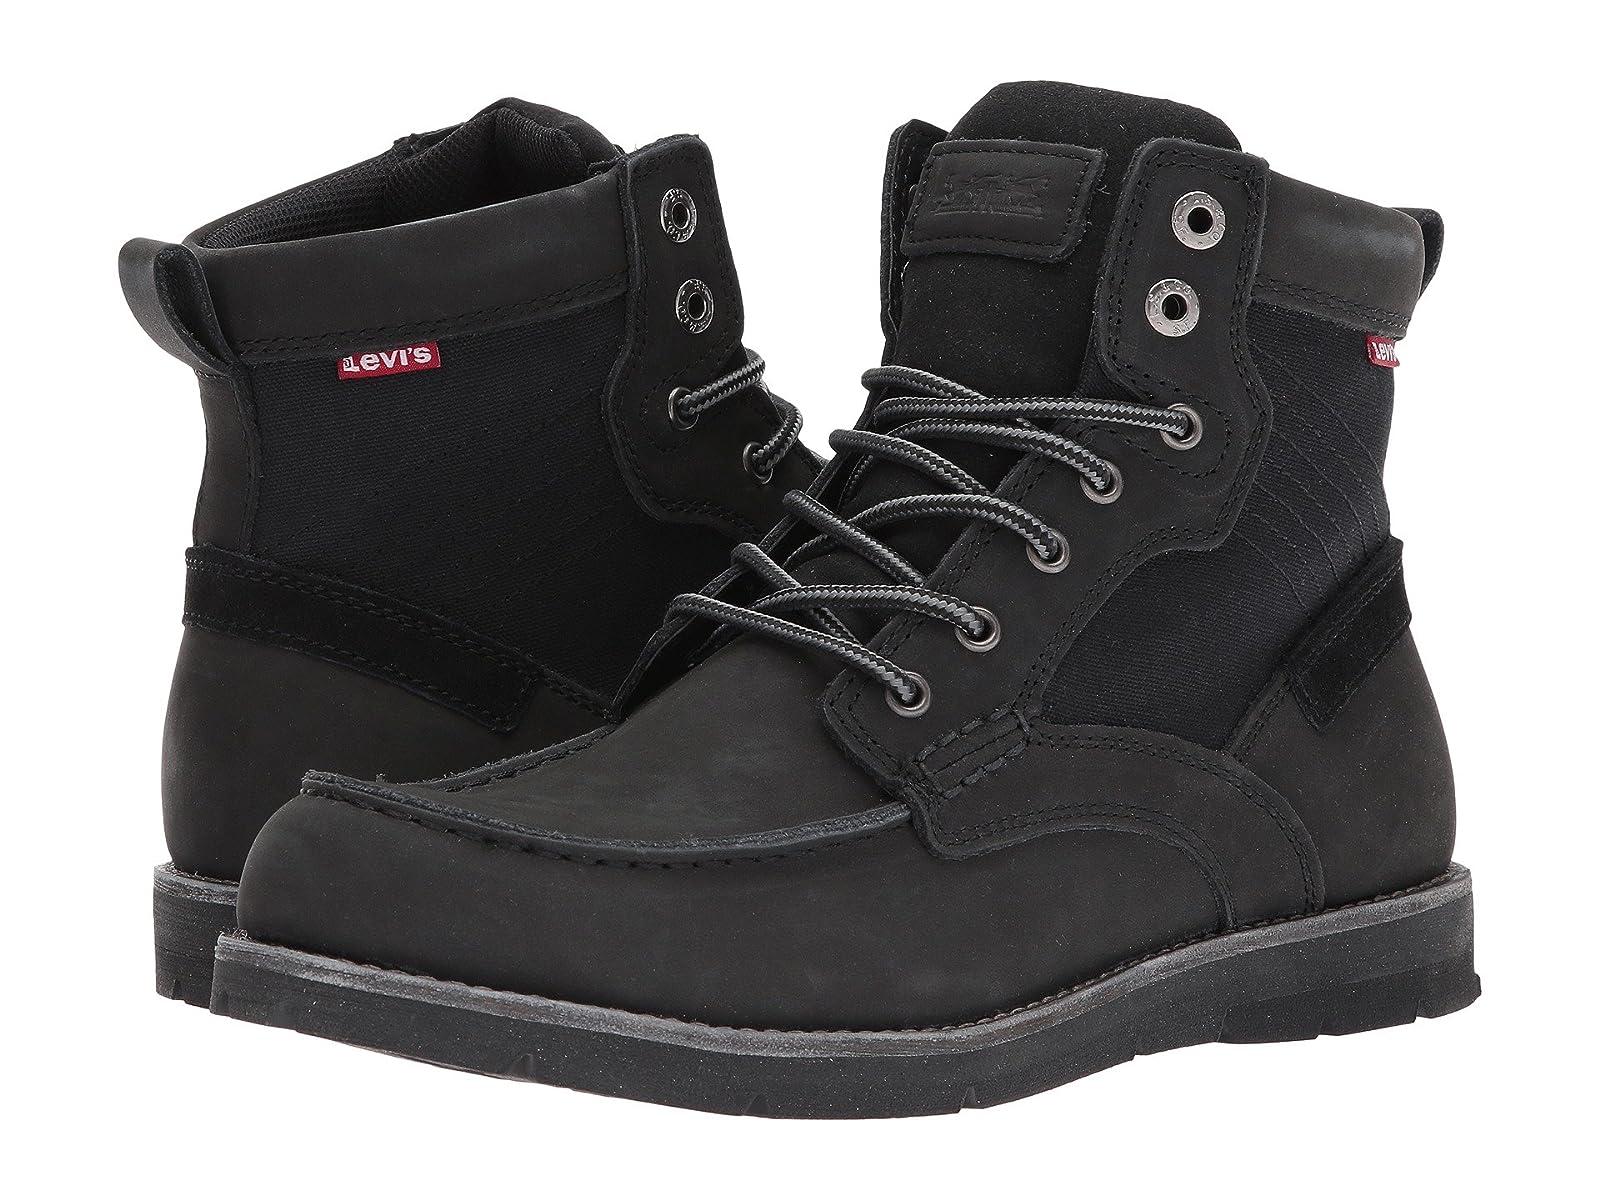 Levi's® Shoes Dawson NubuckAffordable and distinctive shoes